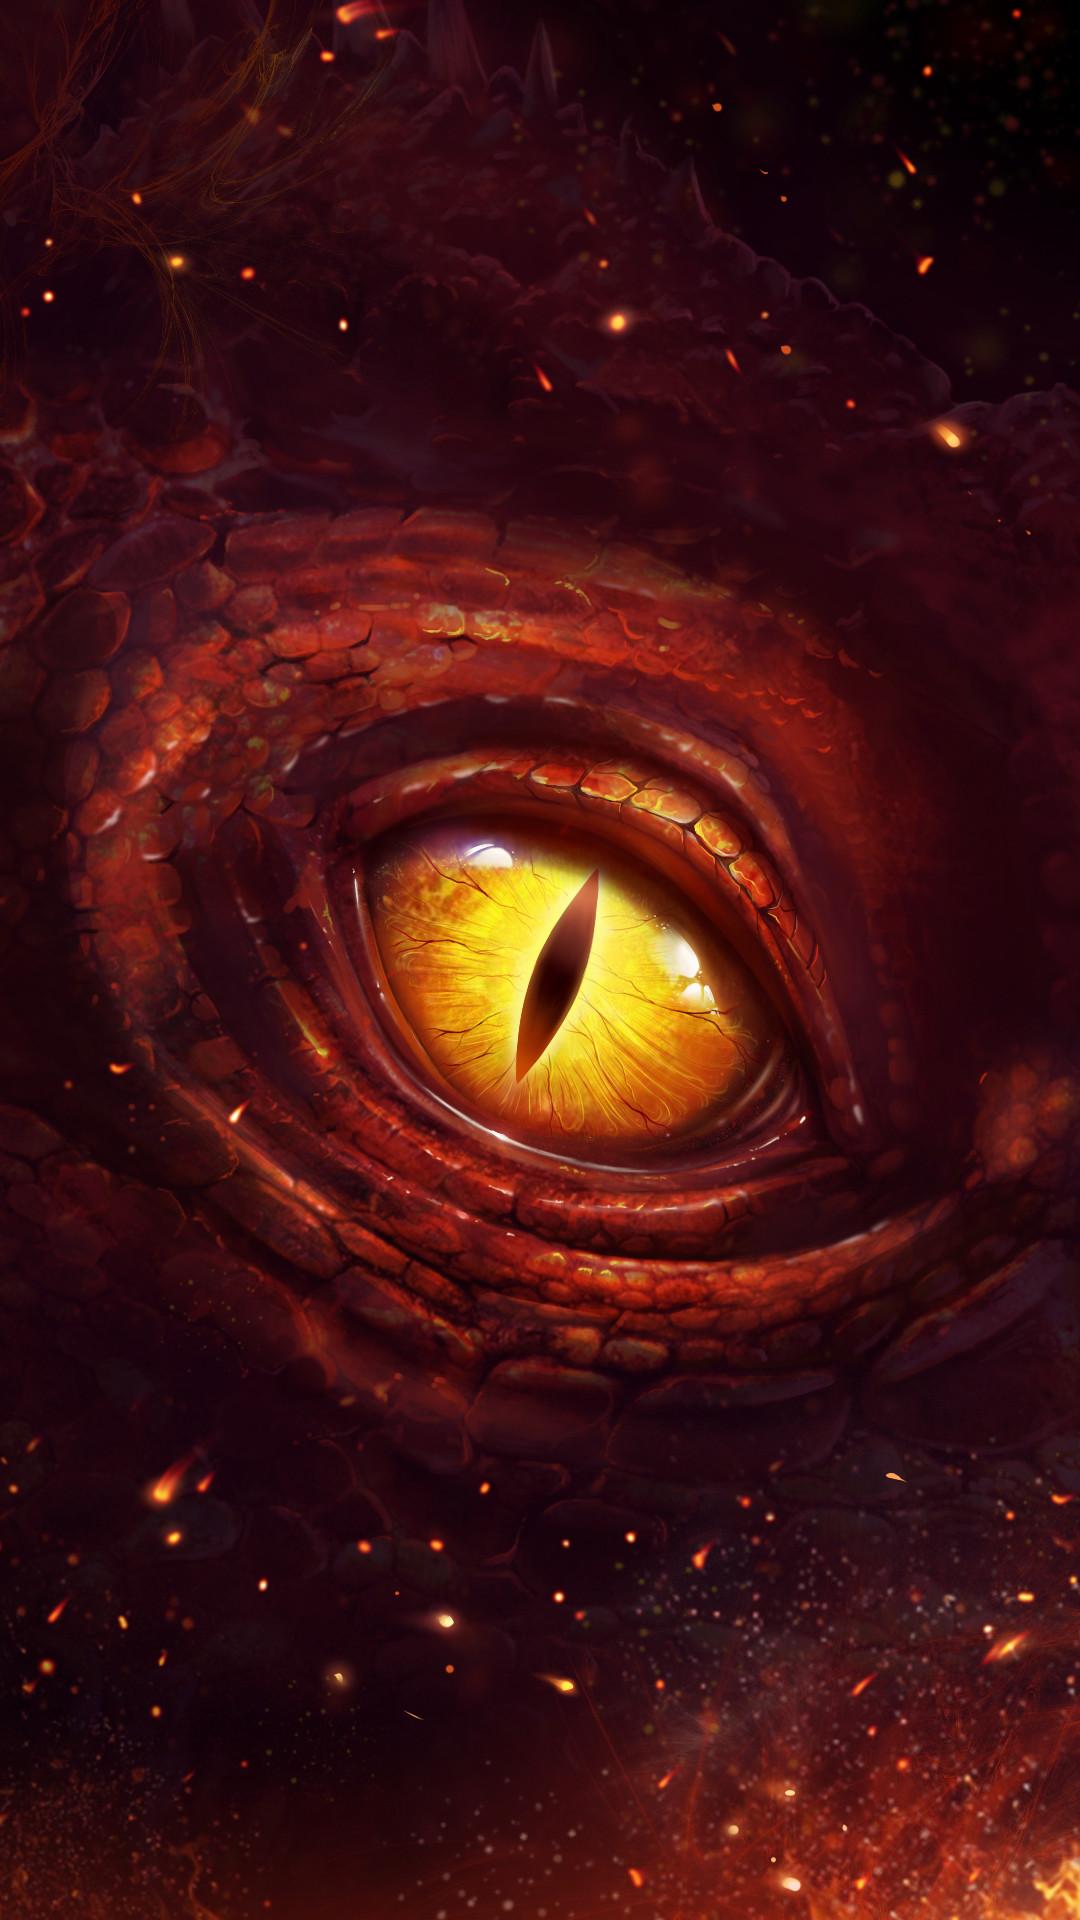 Horrible dragon eye wallpaper!